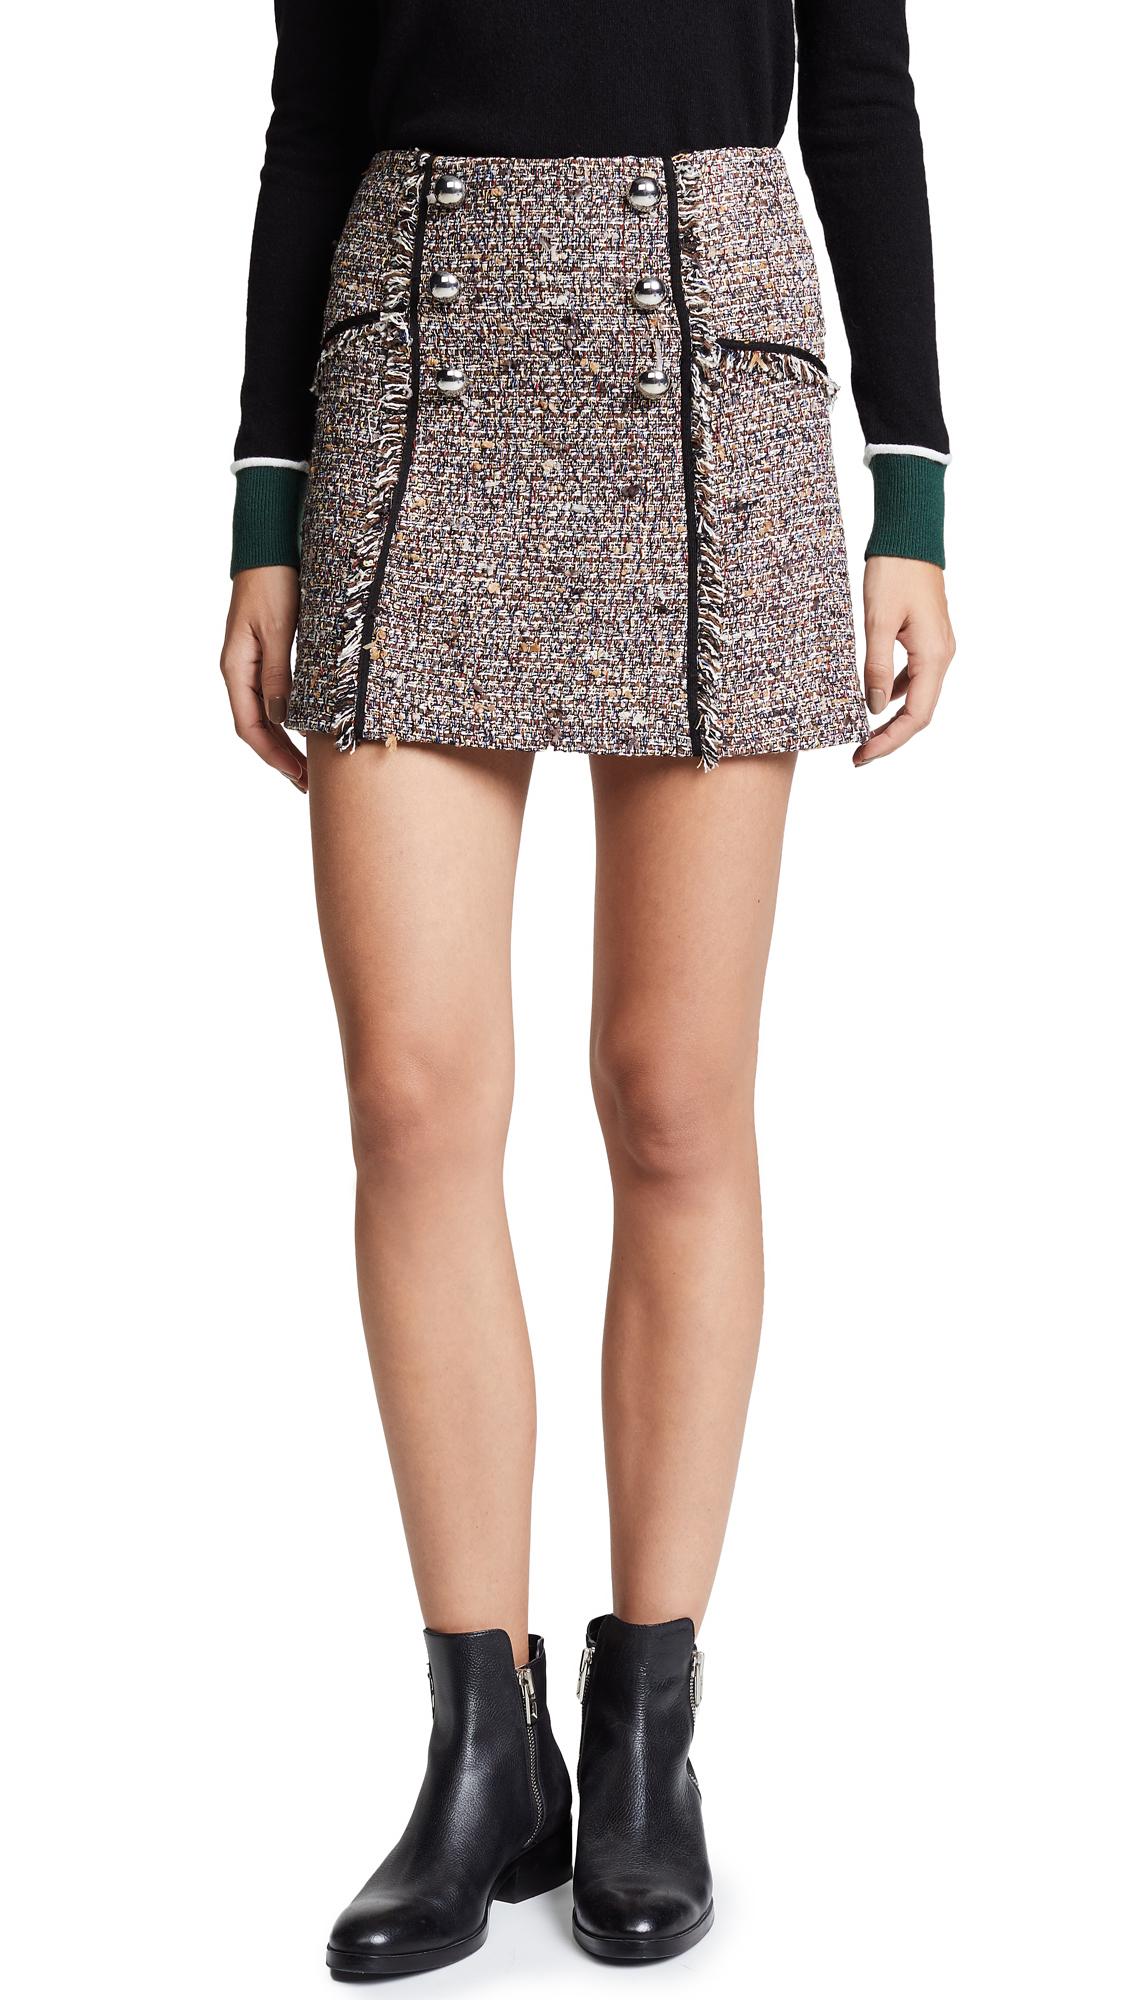 Veronica Beard Starck Skirt - Brown Multi